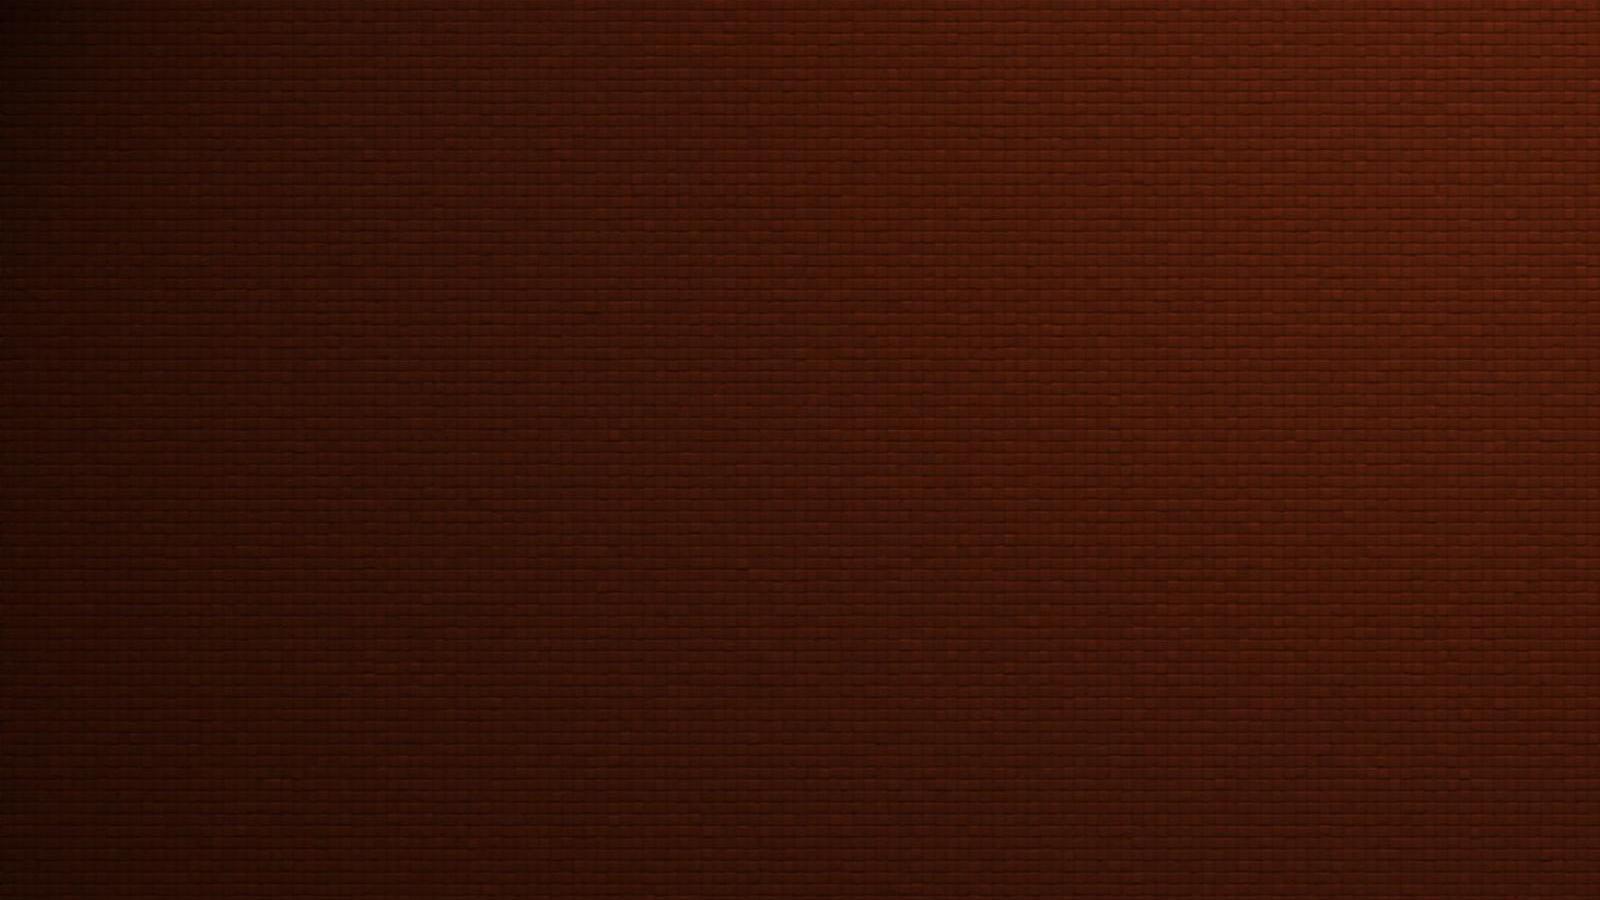 1600x900 Brown Windows Wallpaper Abstract Brown Wallpaper 1600x900